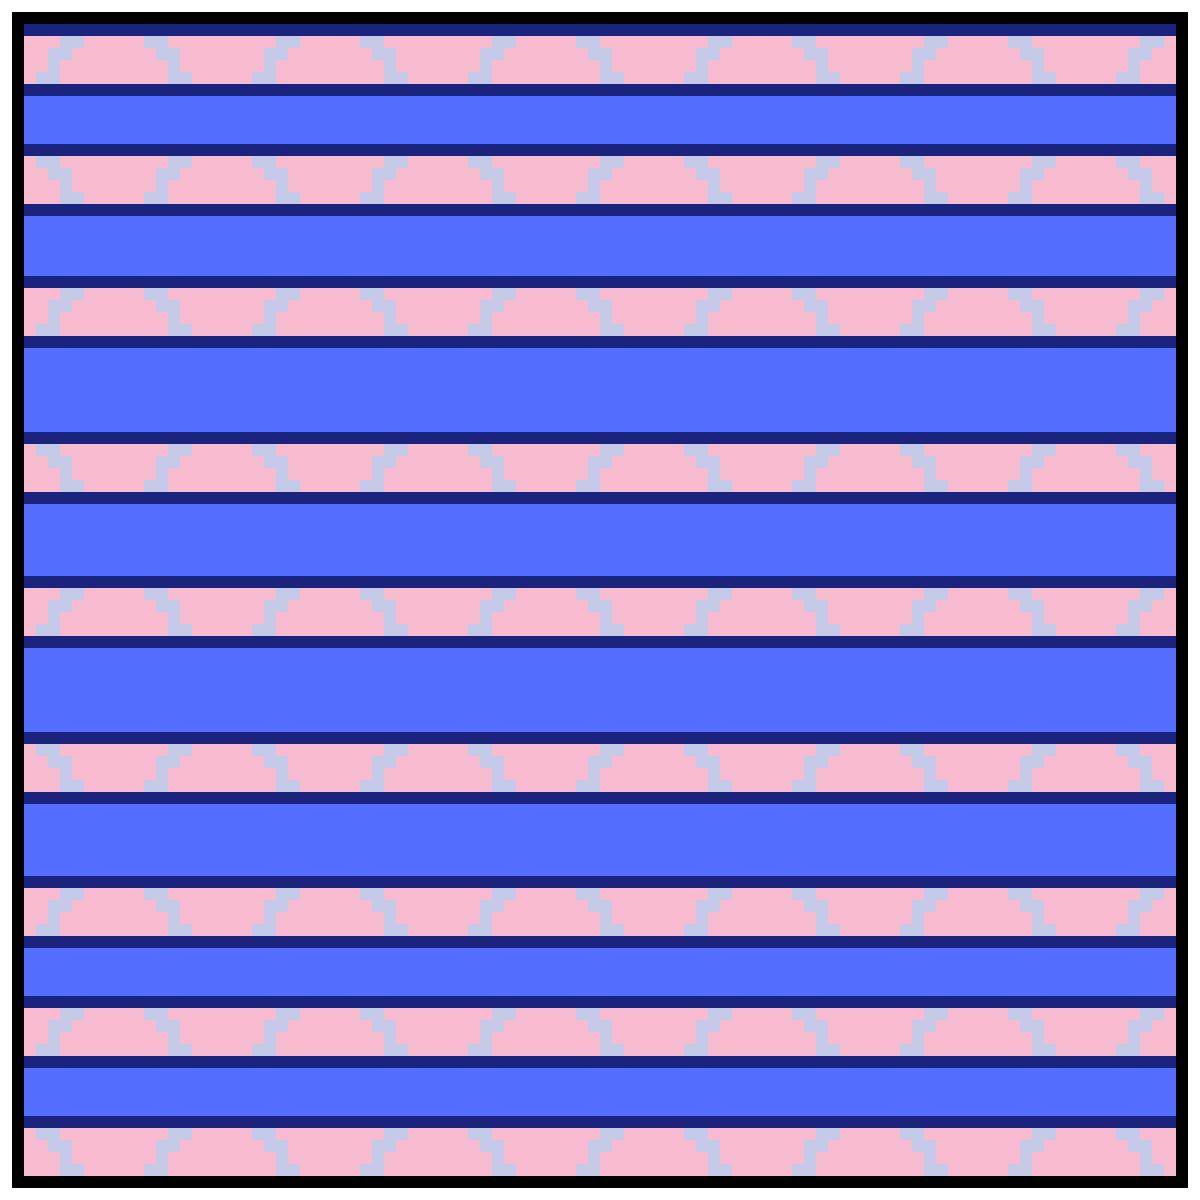 pattern by Nemo123